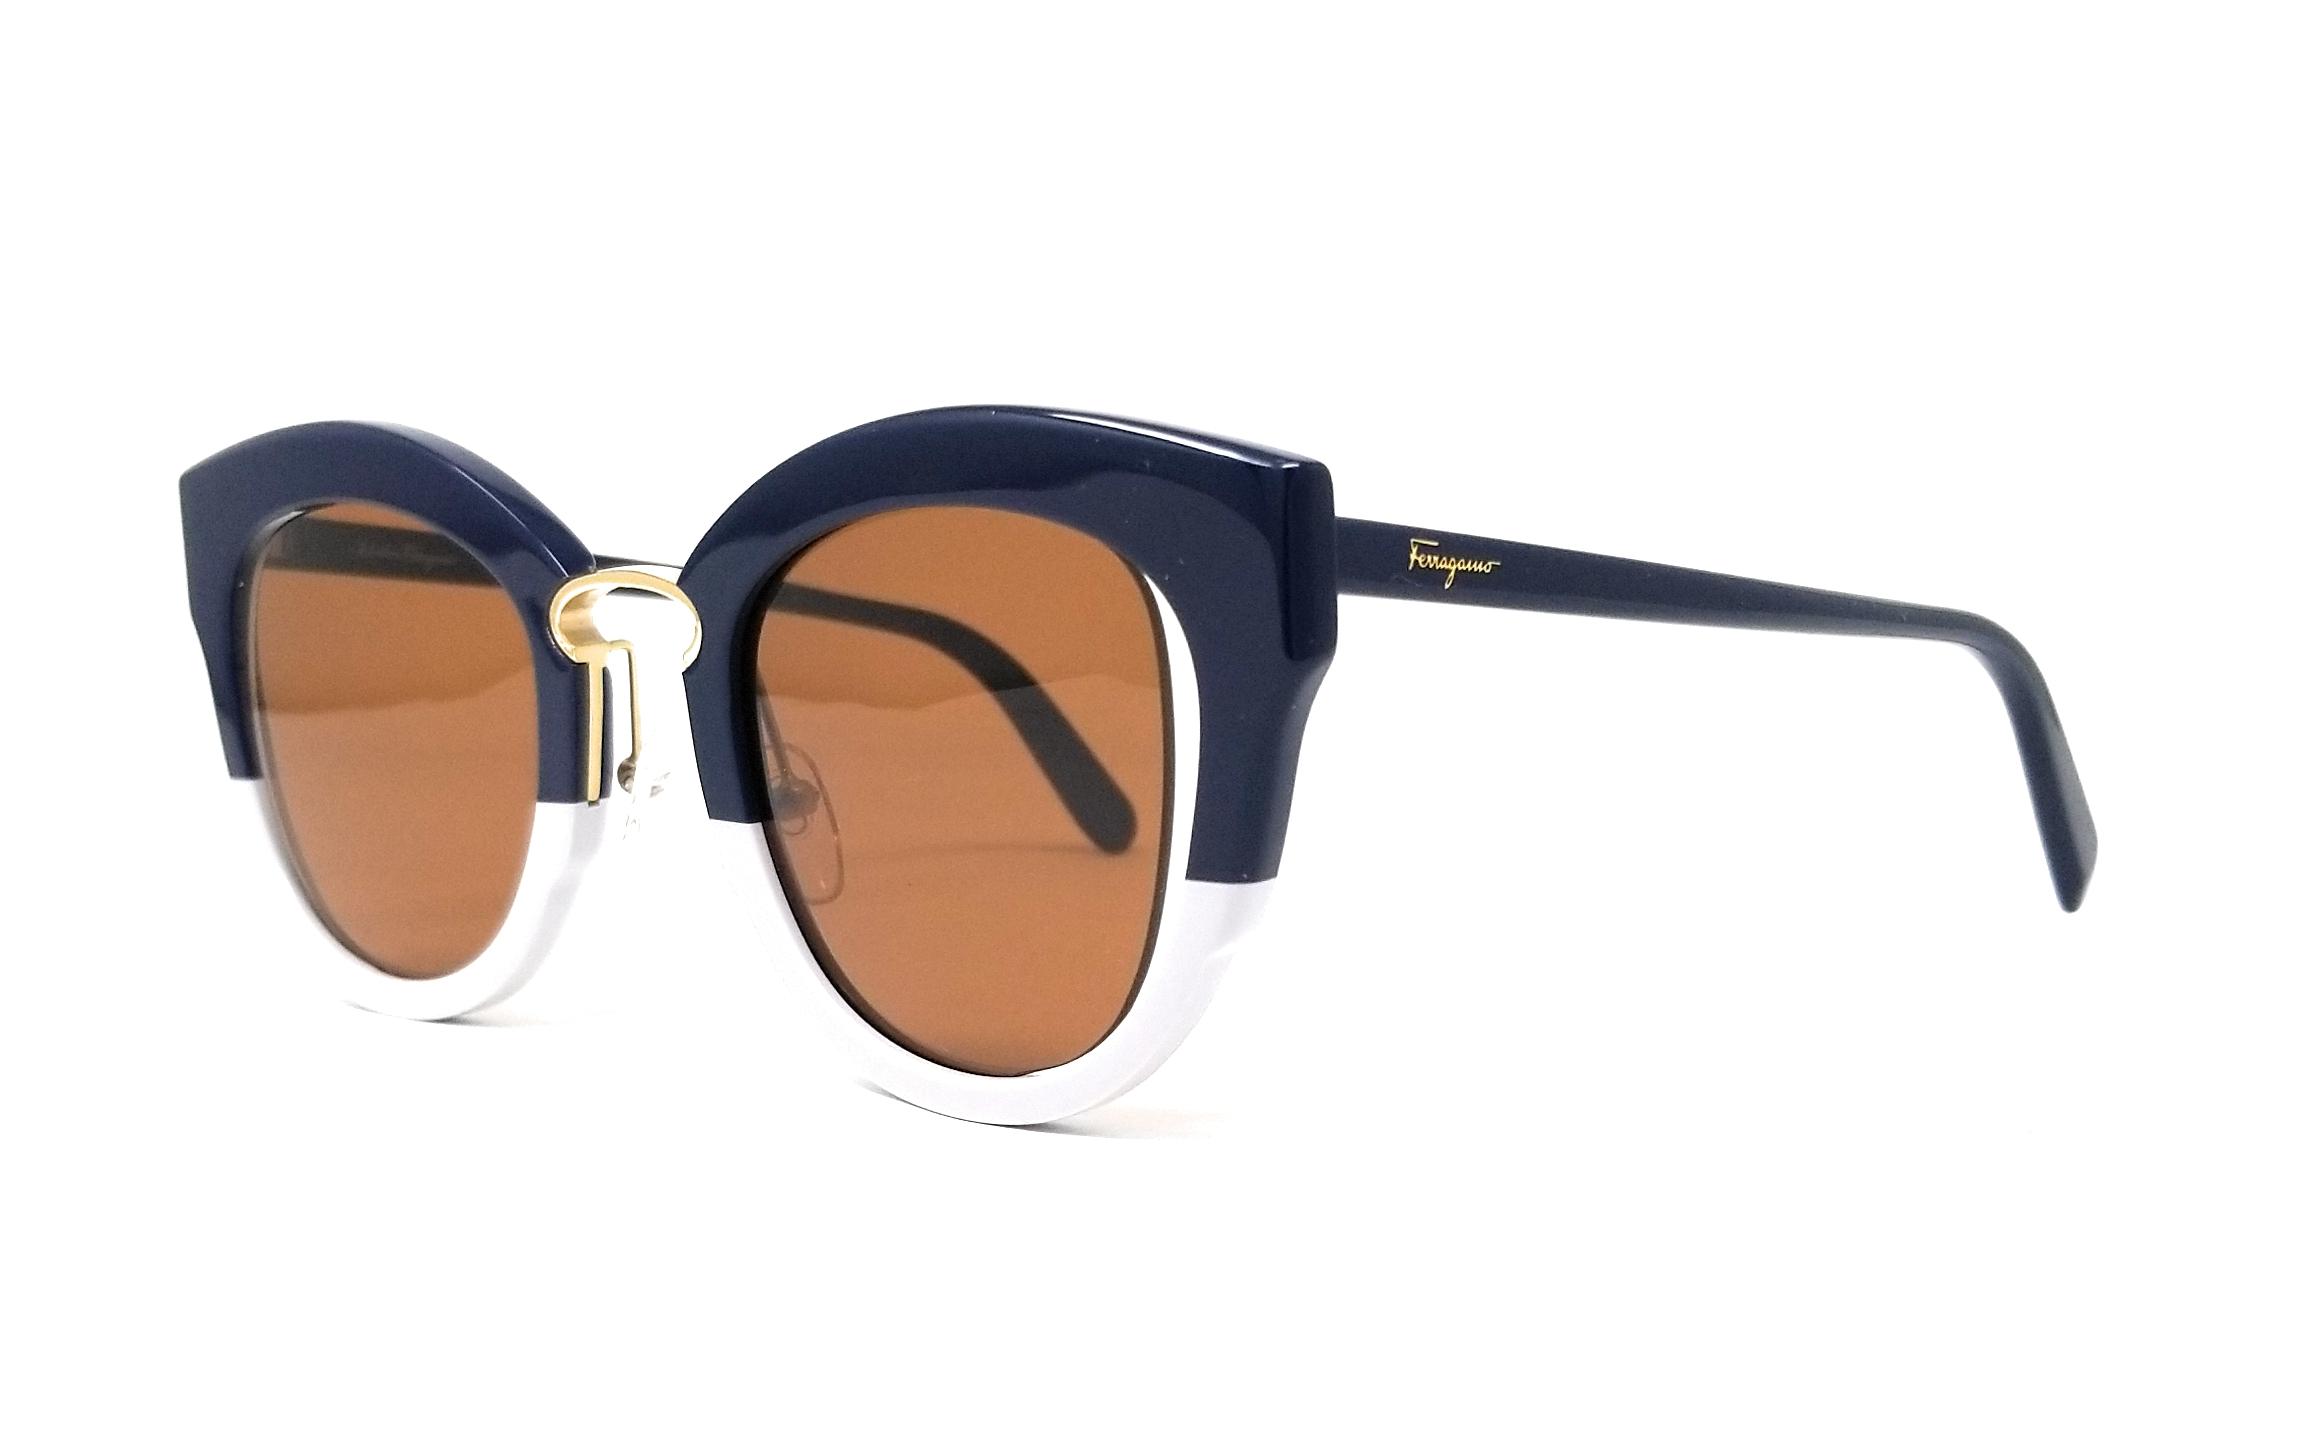 0d6cd90cdf4 Salvatore Ferragamo Sunglasses SF830S 464 Blue-Grey Butterfly 48x24x145